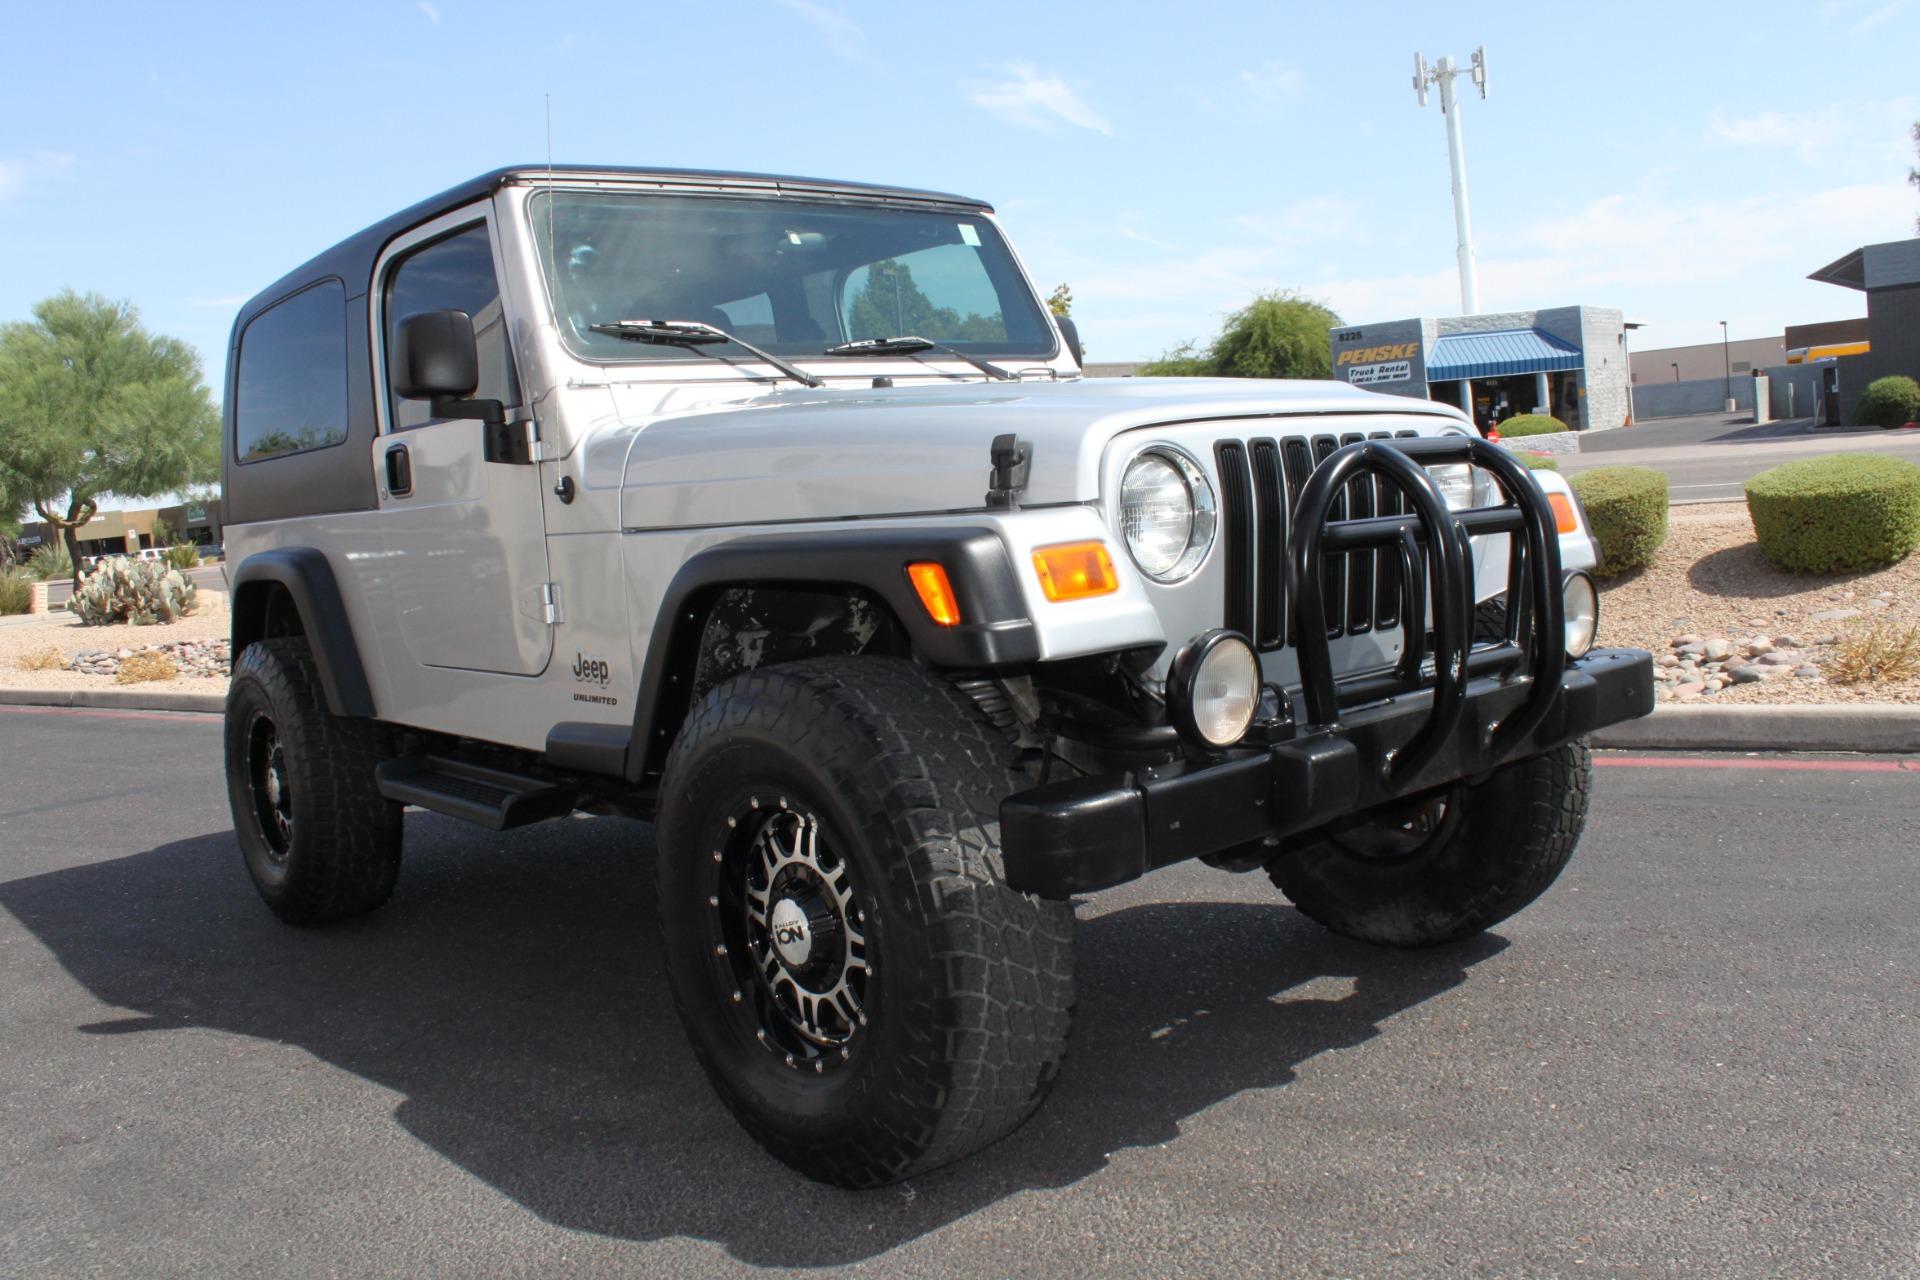 Used-2006-Jeep-Wrangler-Unlimited-LWB-Wrangler